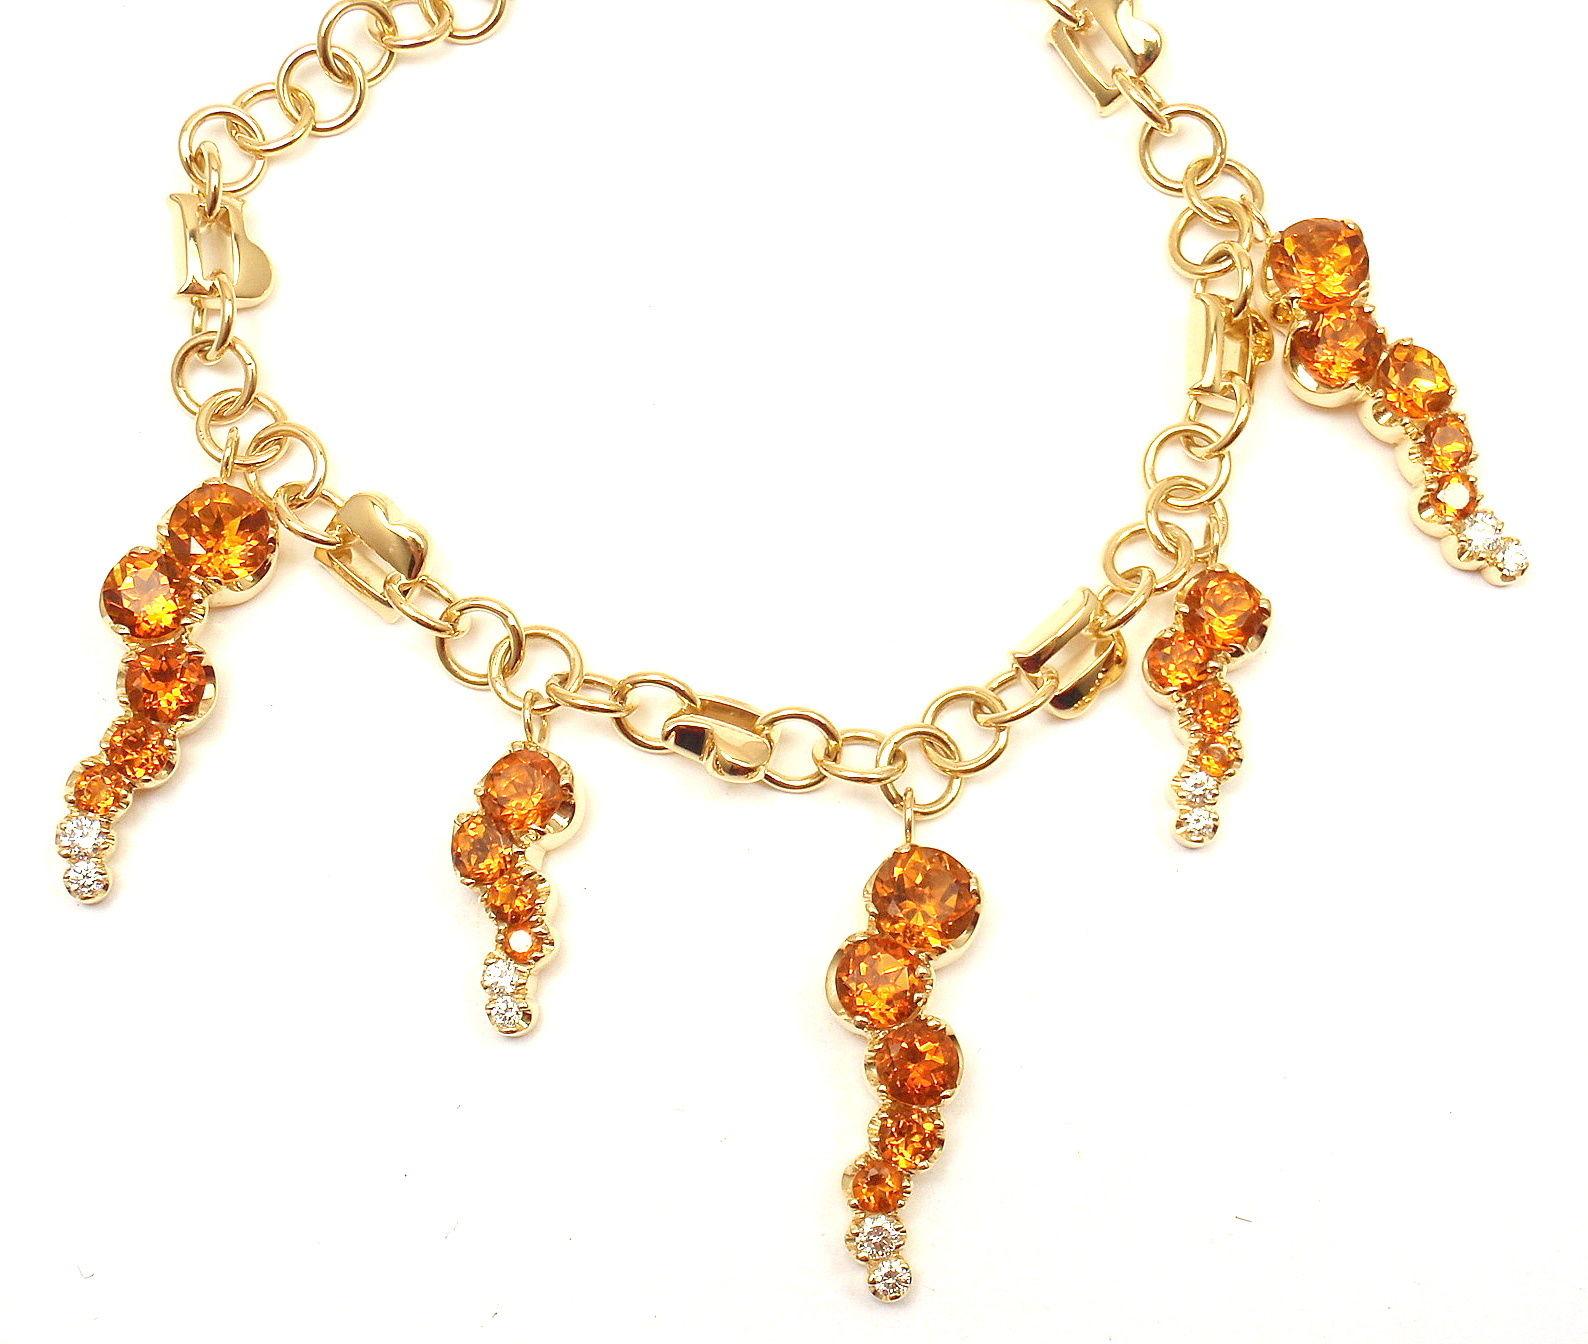 """""Pasquale Bruni 18K Yellow Gold Ray Sun Citrine Diamond Bracelet"""""" 301608"